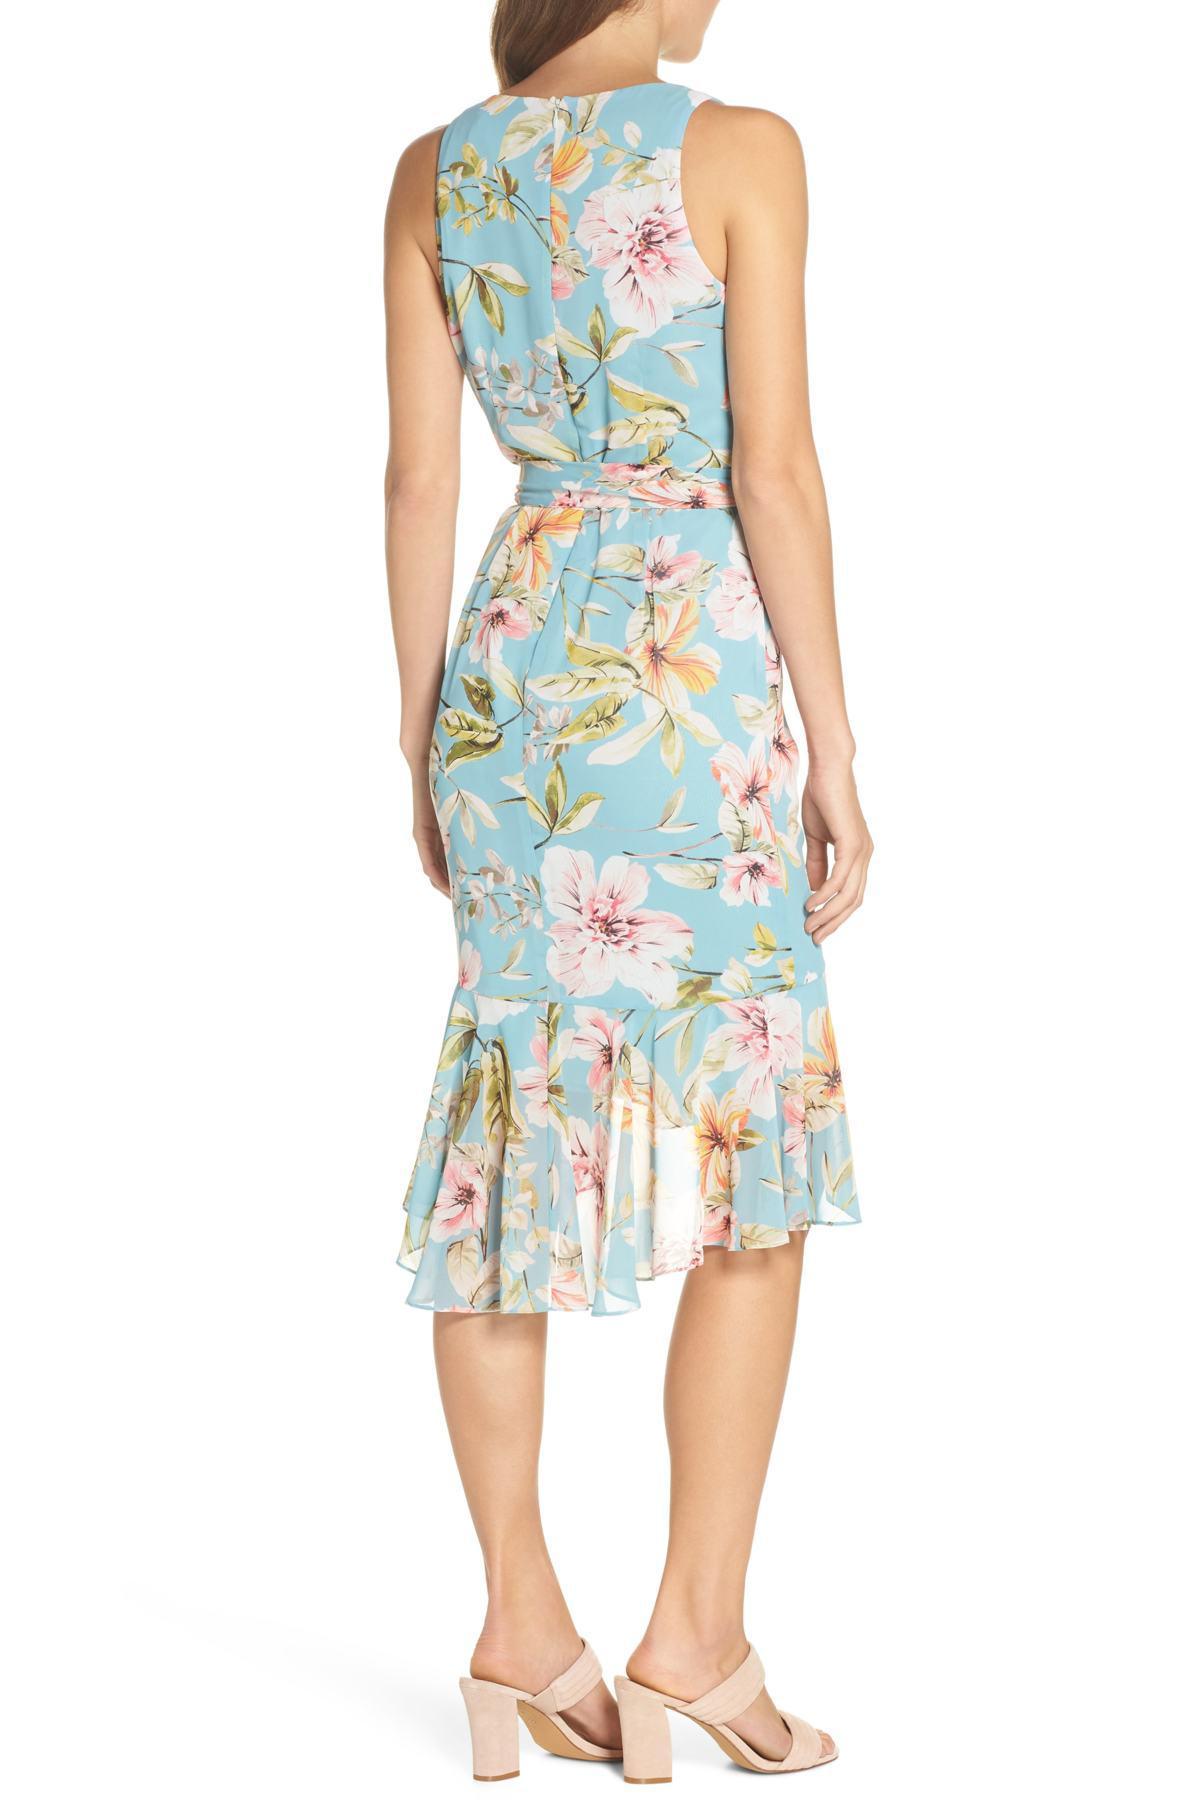 e185c01c07 Eliza J - Blue Floral Print Faux Wrap Midi Dress (regular   Petite) -. View  fullscreen